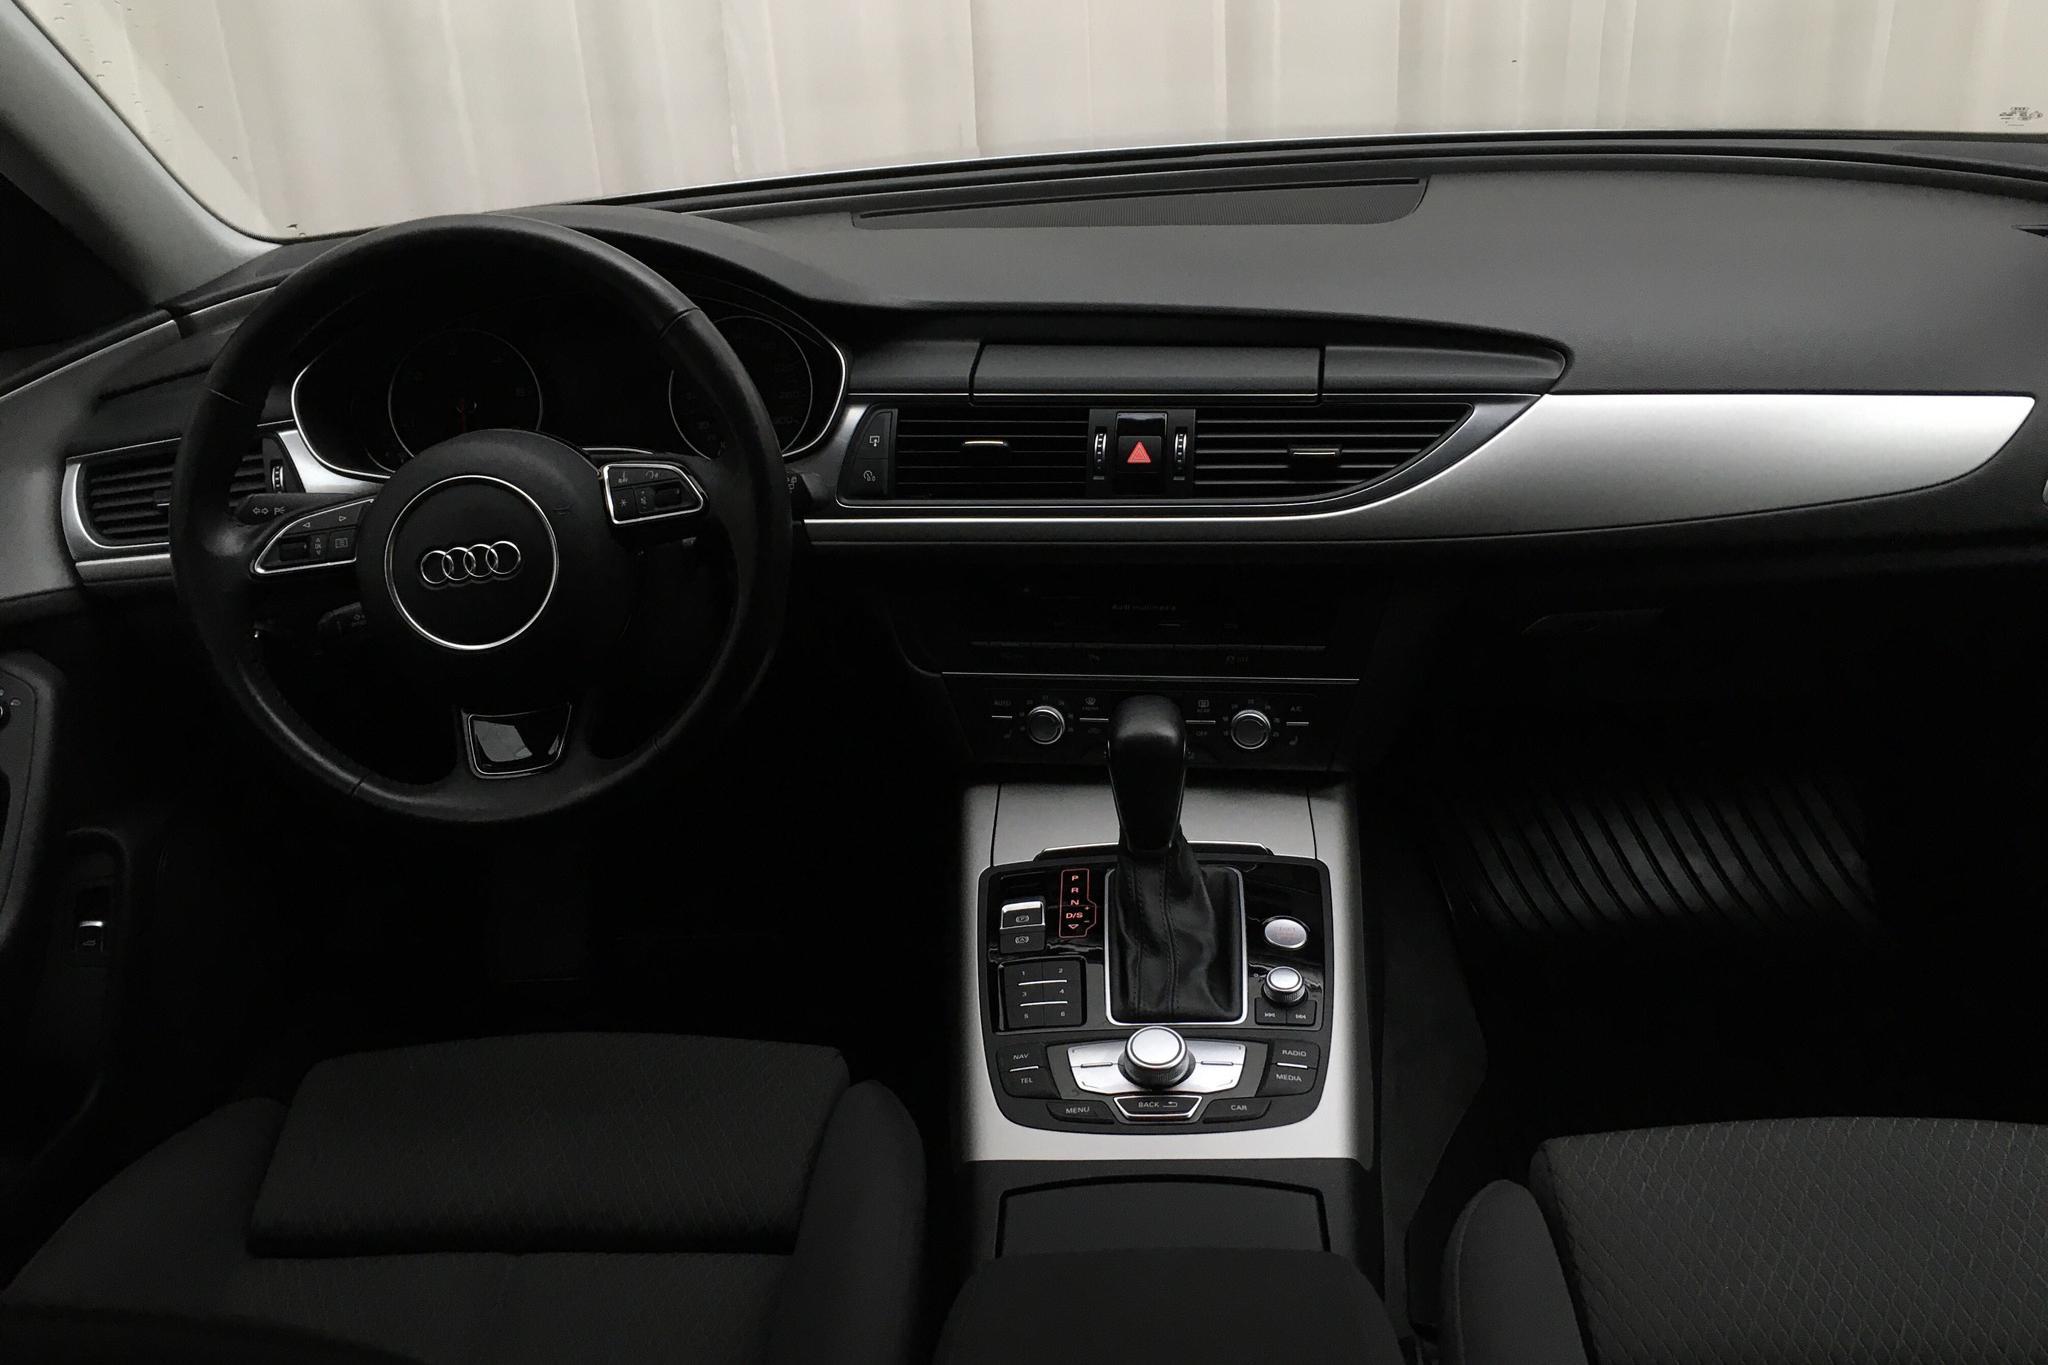 Audi A6 2.0 TDI Avant (190hk) - 16 310 km - Automatic - gray - 2017